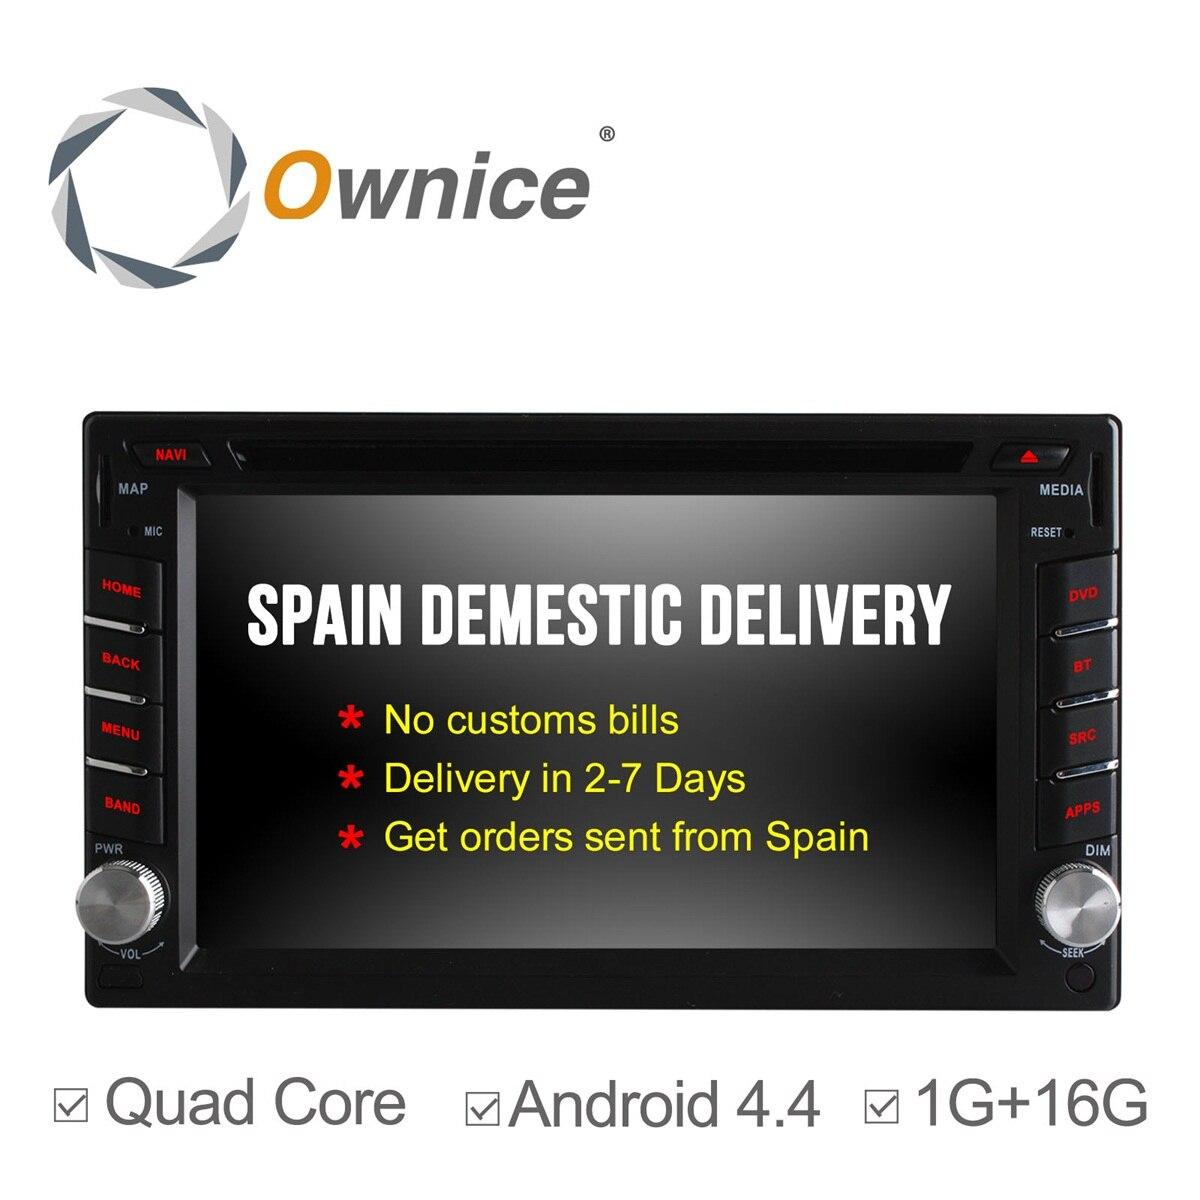 imágenes para C300 ownice quad core android 4.4 universal de coches reproductor de dvd gps navegación 2Din Car Stereo Radio 16G ROM soporte enlace espejo IPOD